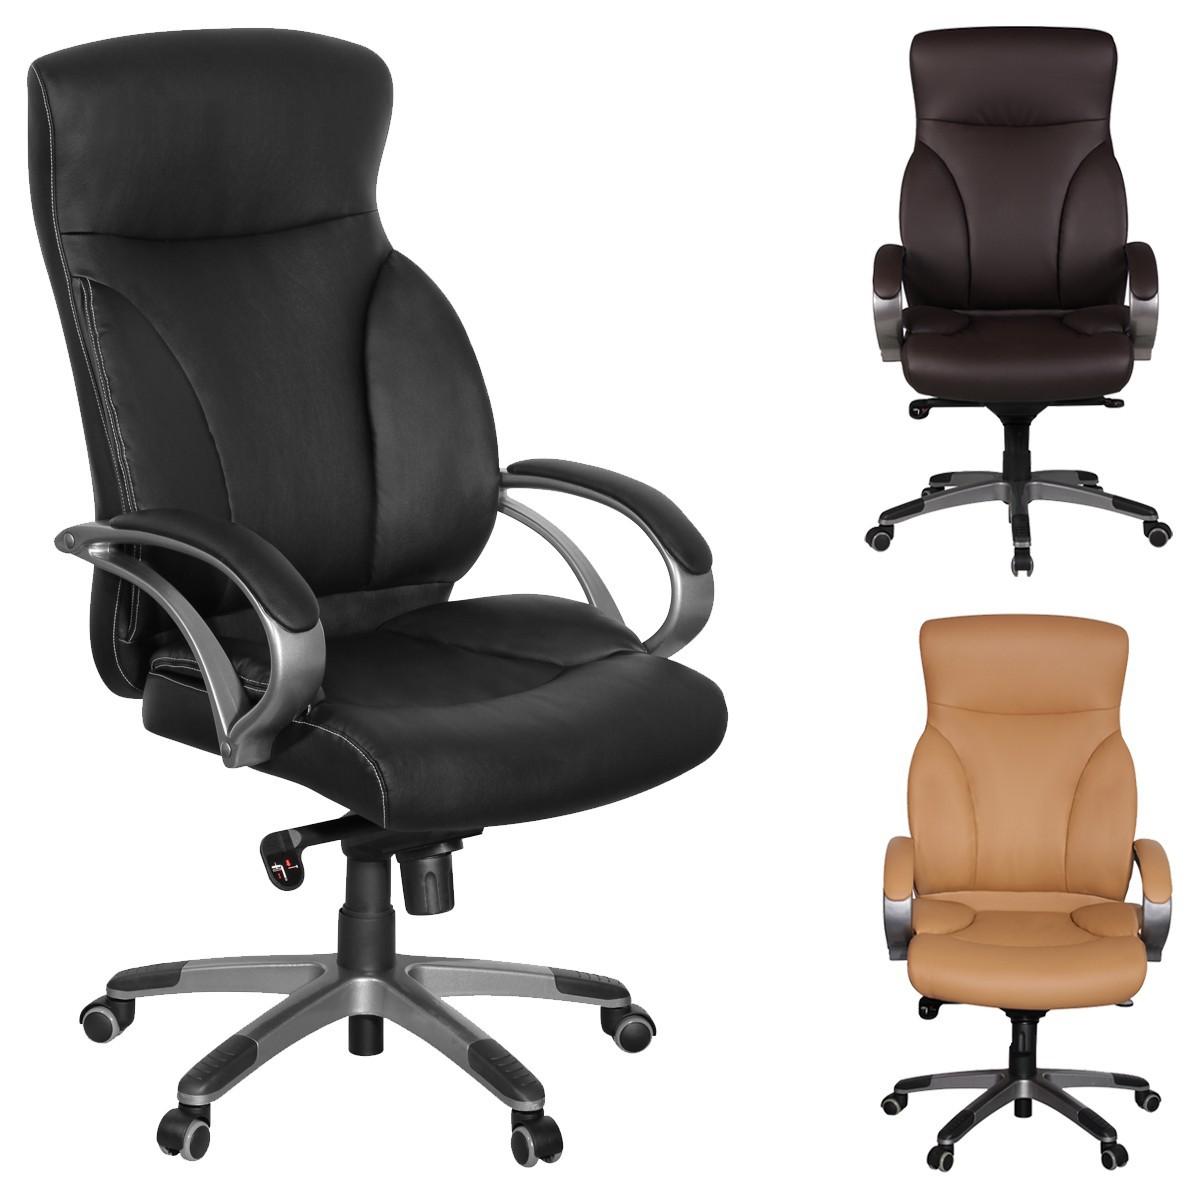 Drehstuhl ergonomisch  FineBuy BONN Bürostuhl ergonomisch Schreibtischstuhl Kunstleder ...